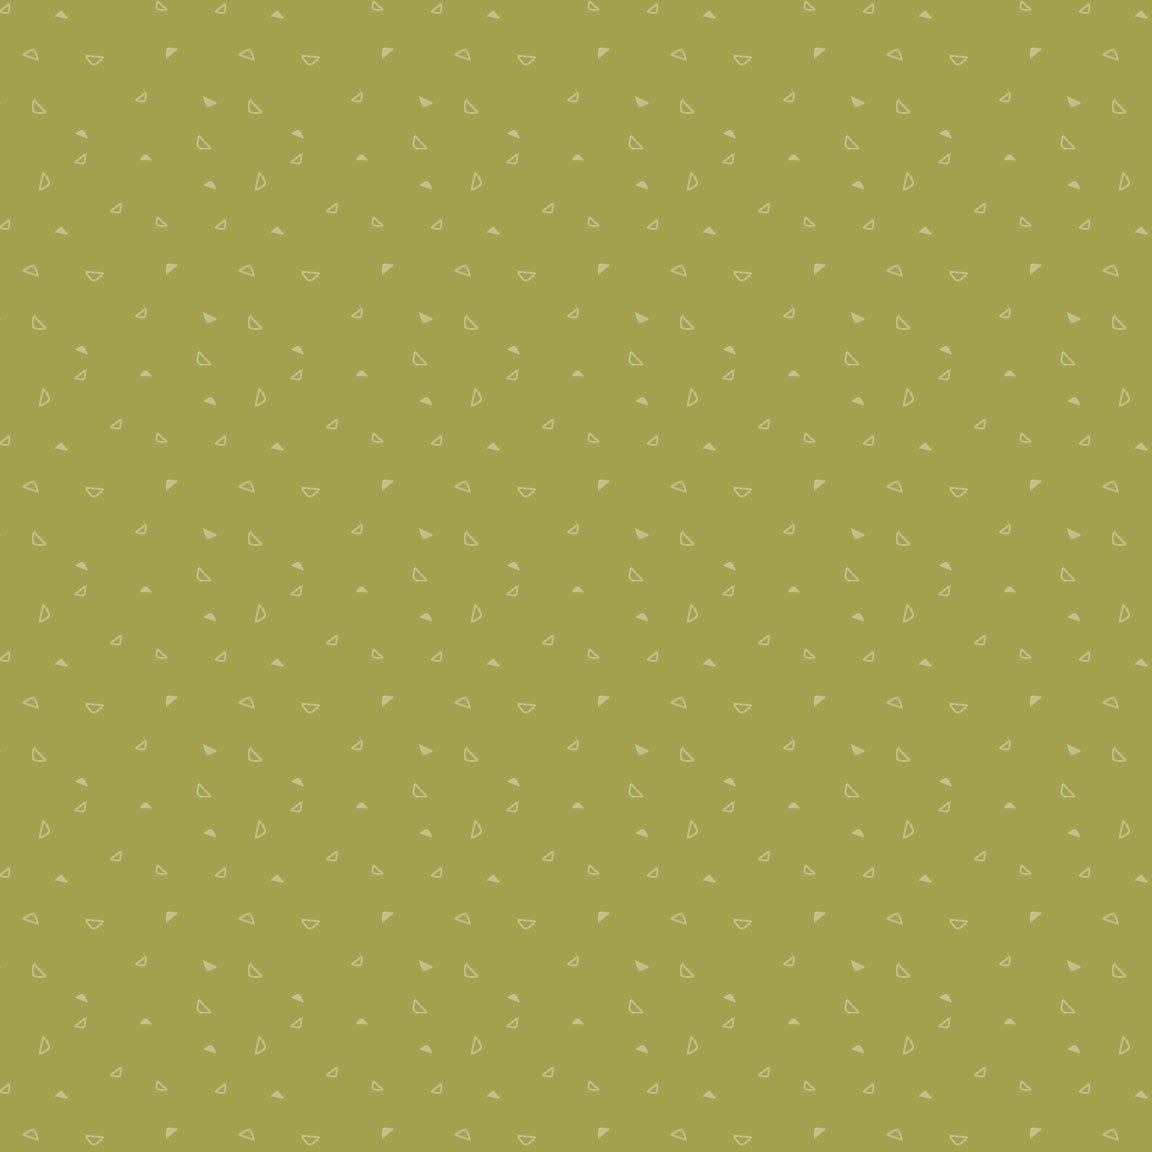 Blenders - Green